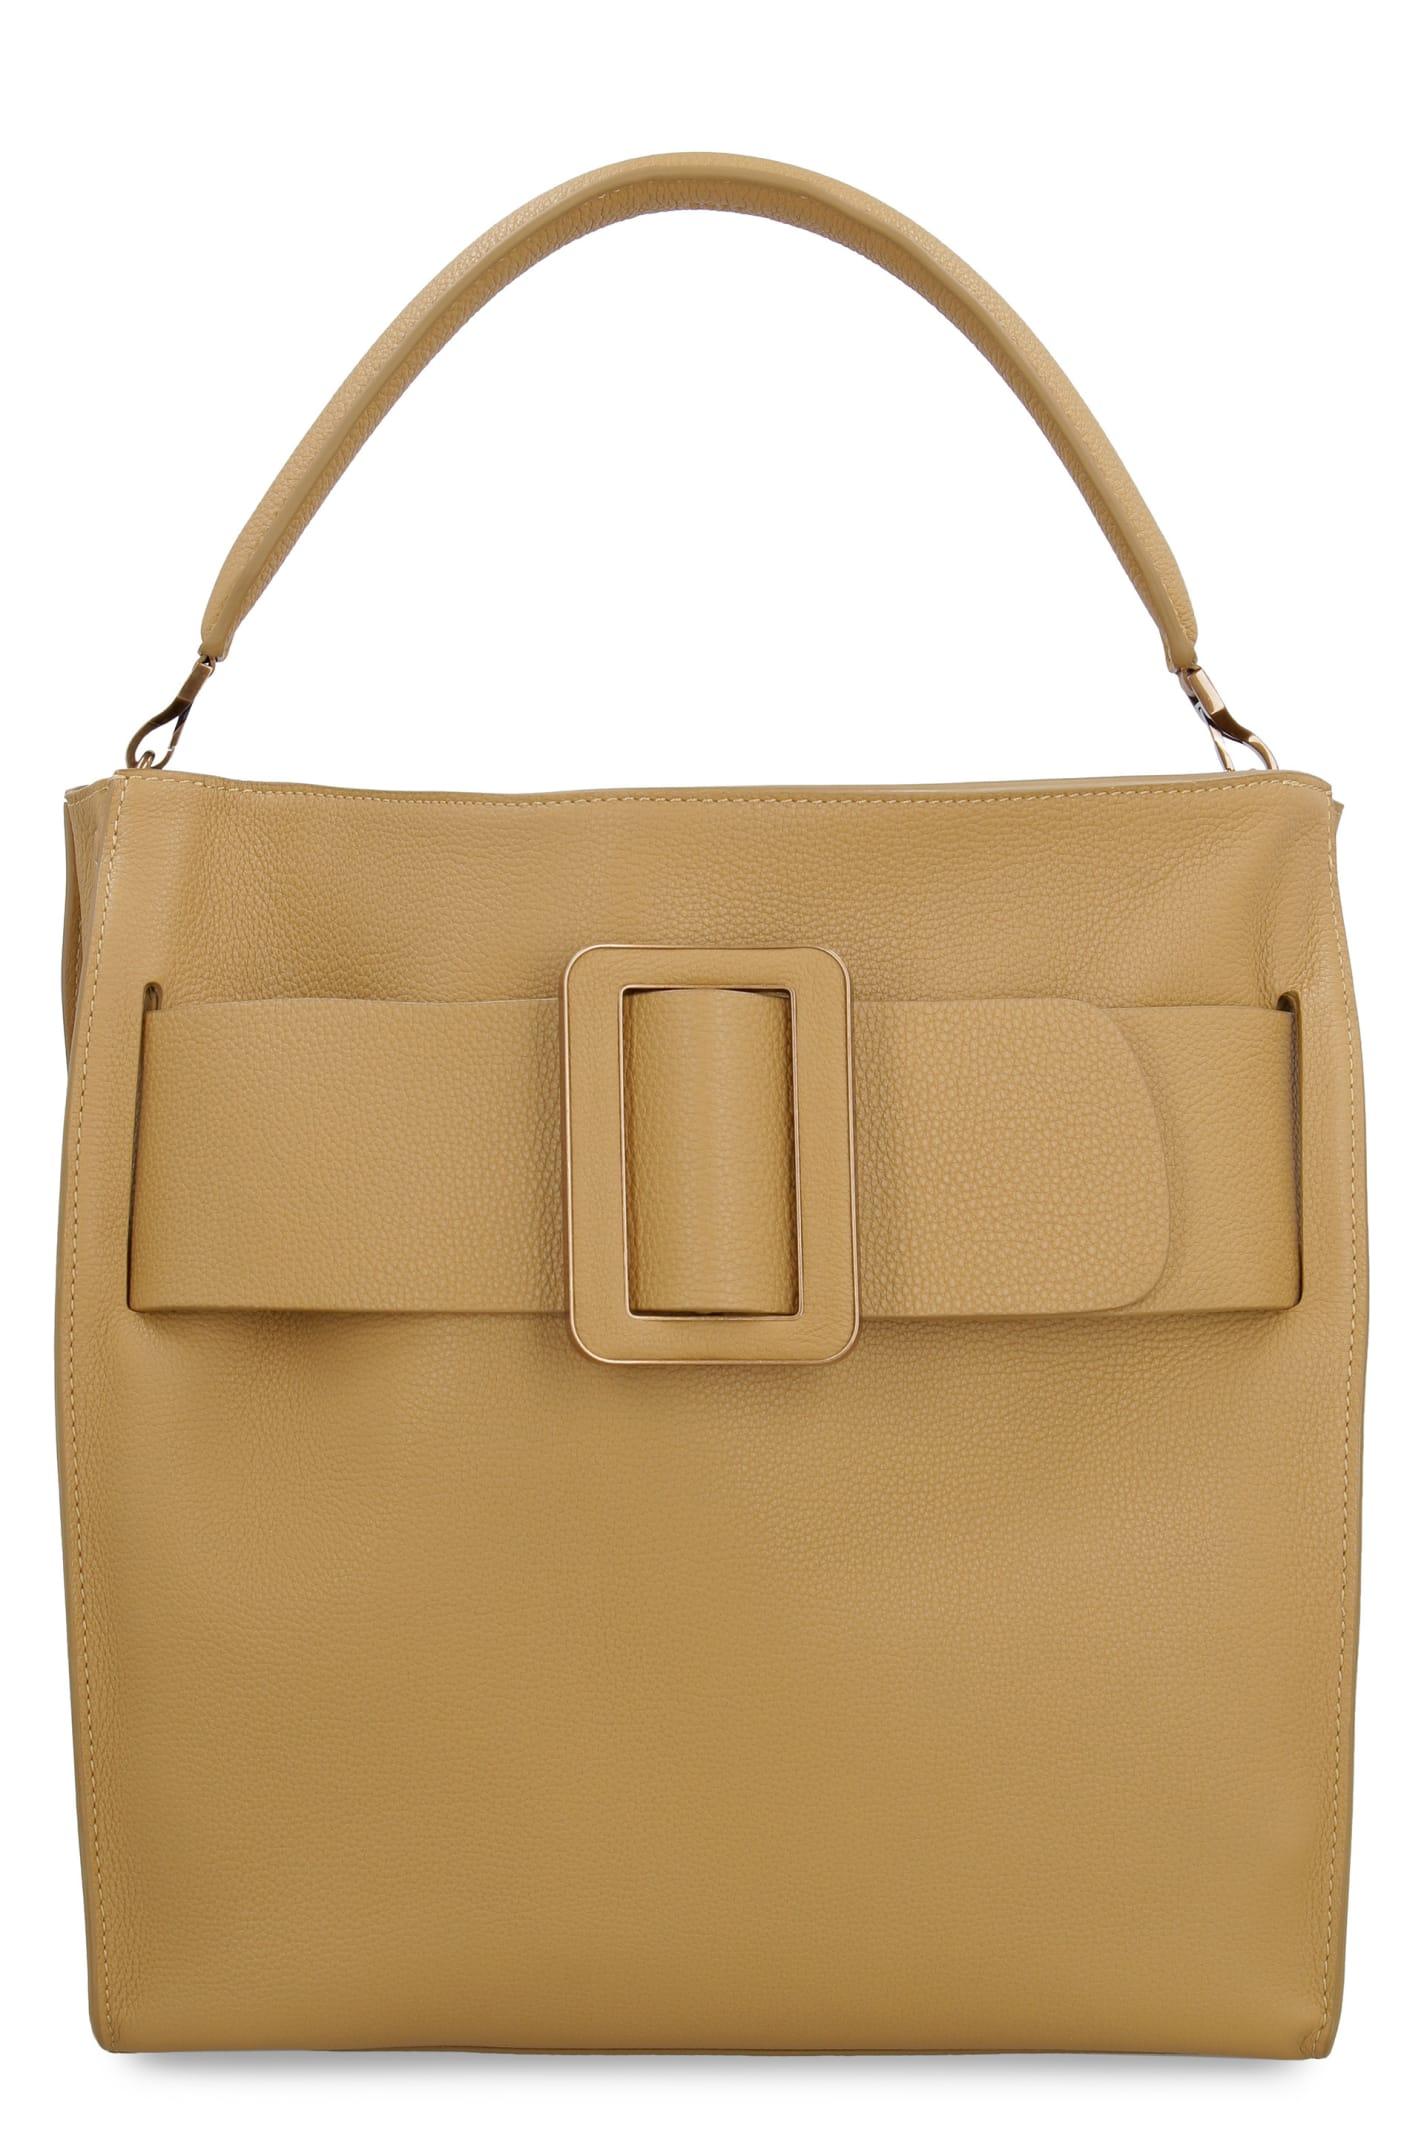 Devon Soft Leather Hobo-bag